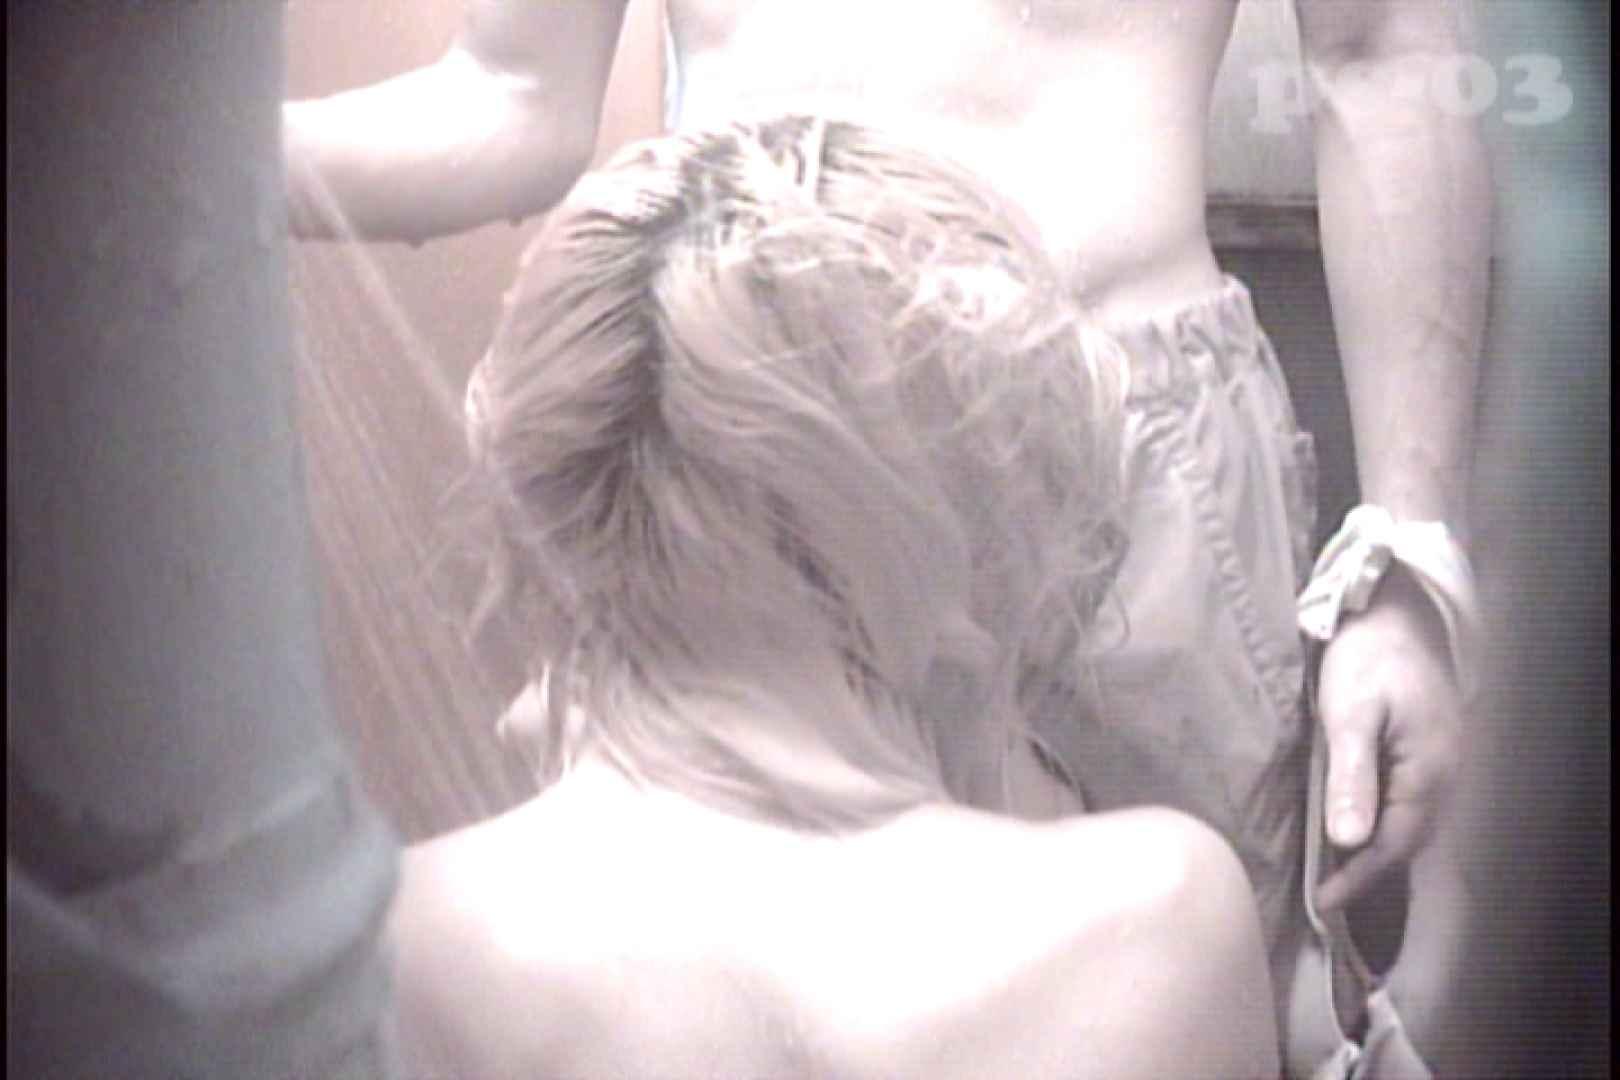 File.21 生理の日は男のアナルを舐め嬢 OLすけべ画像 AV動画キャプチャ 61連発 42